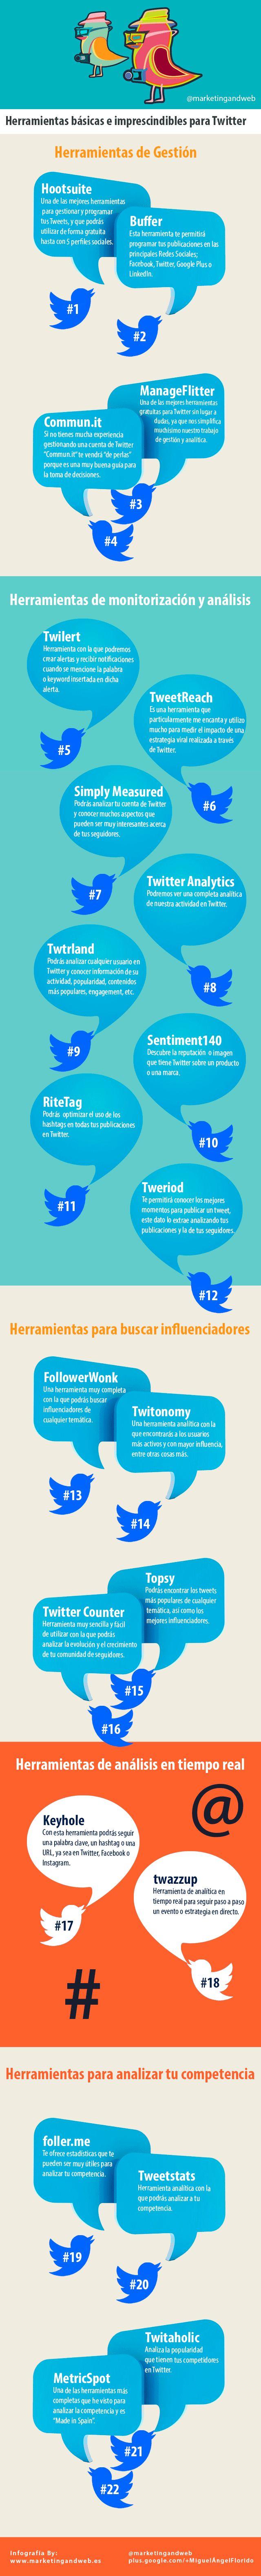 22 herramientas básicas para Twitter (gratuitas) #infographic